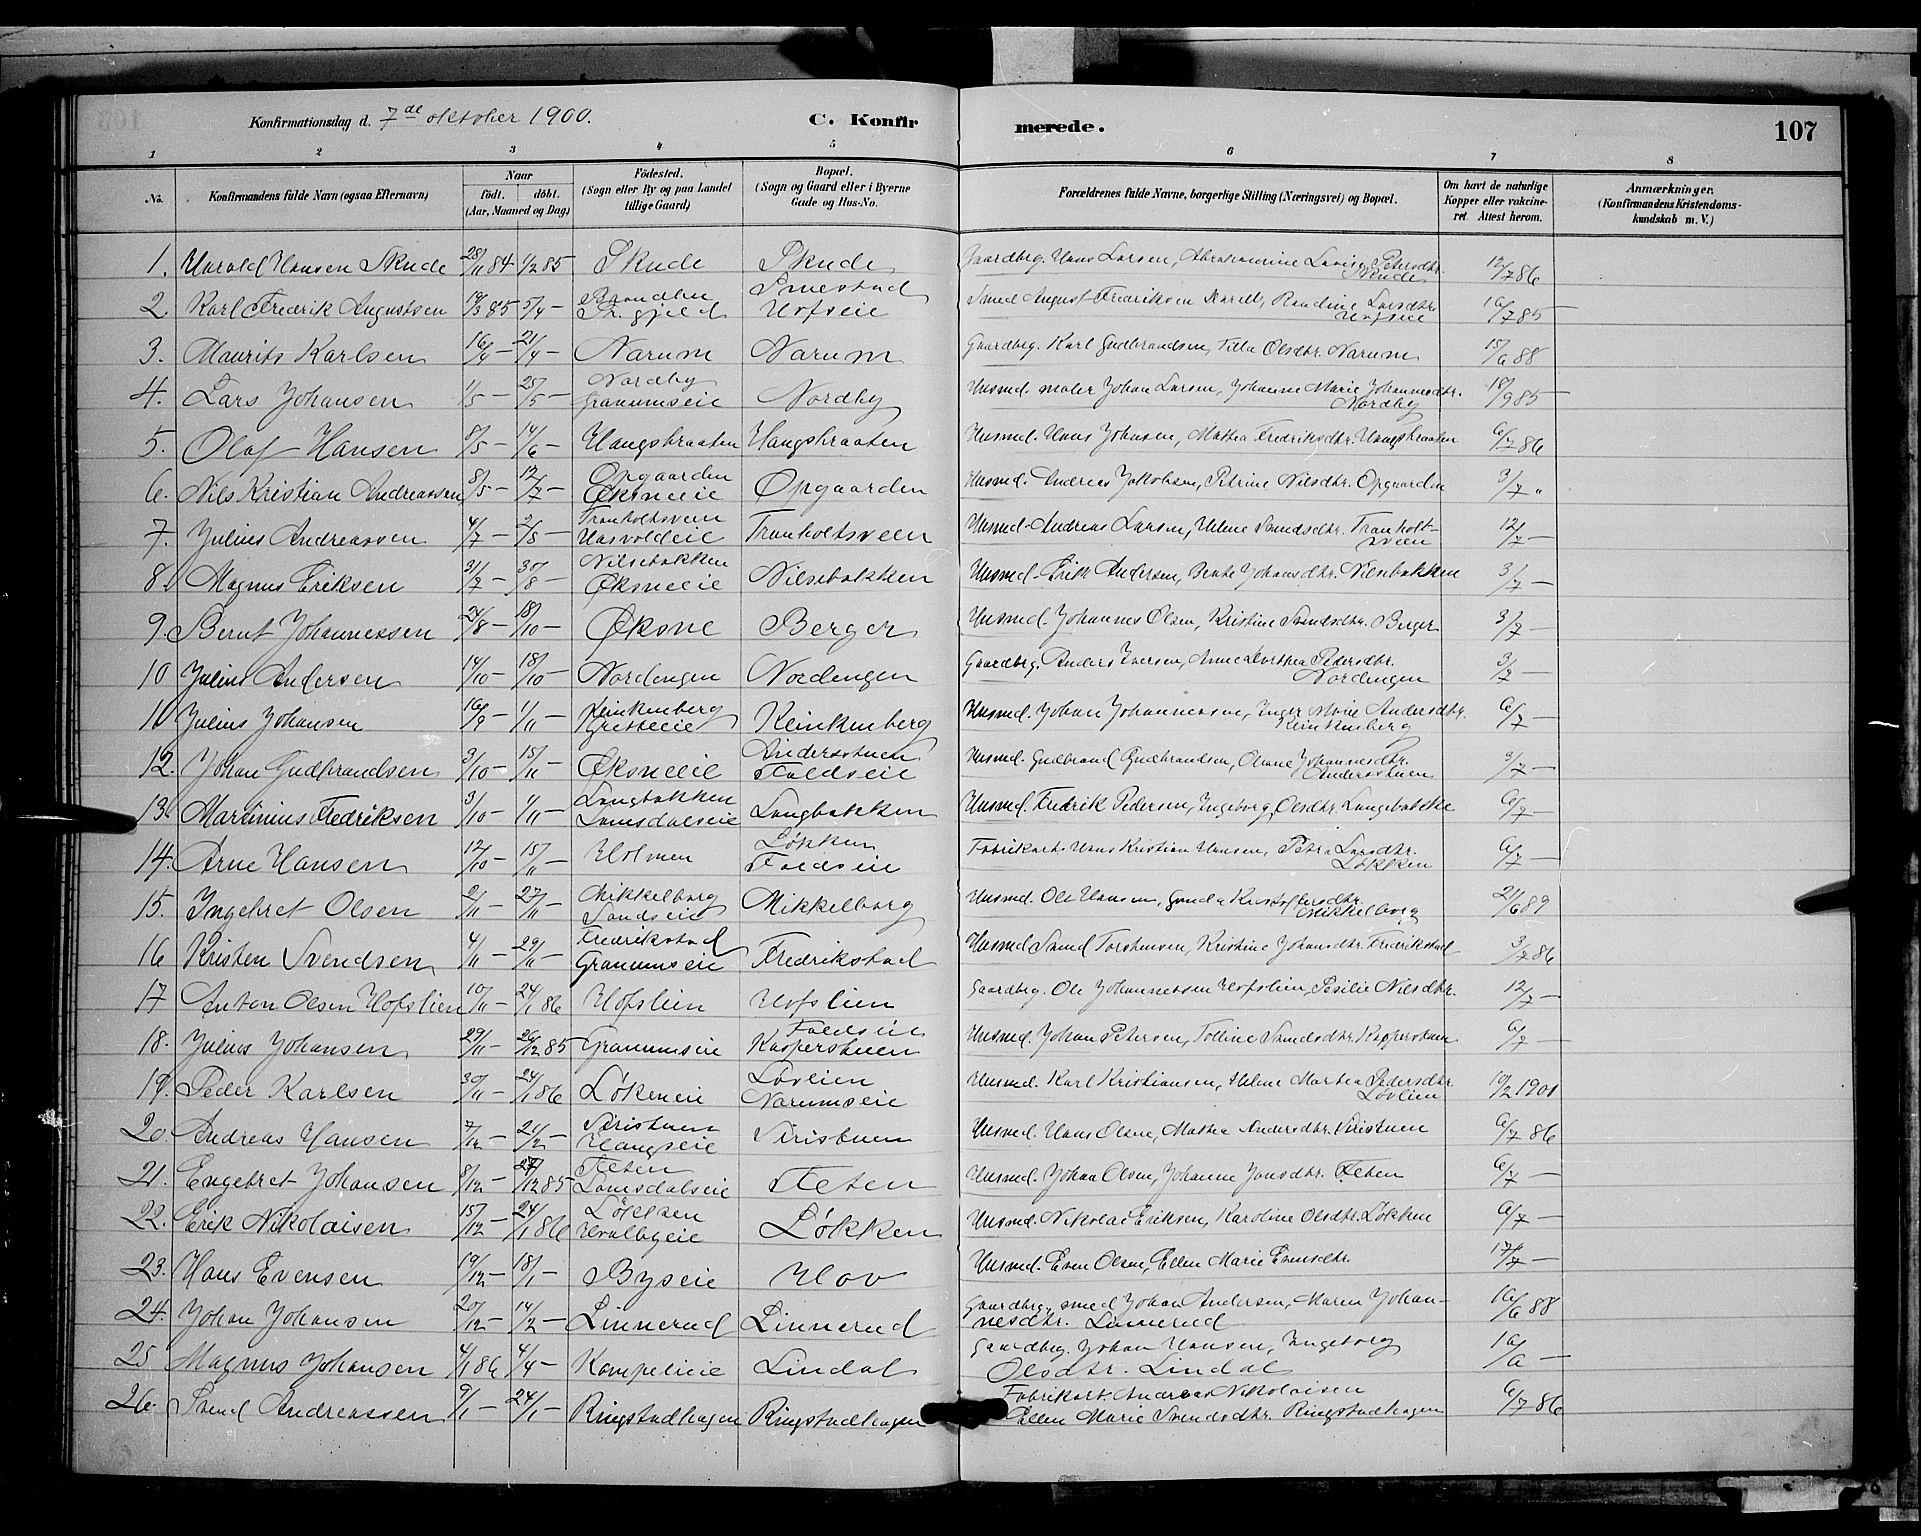 SAH, Søndre Land prestekontor, L/L0002: Klokkerbok nr. 2, 1884-1900, s. 107